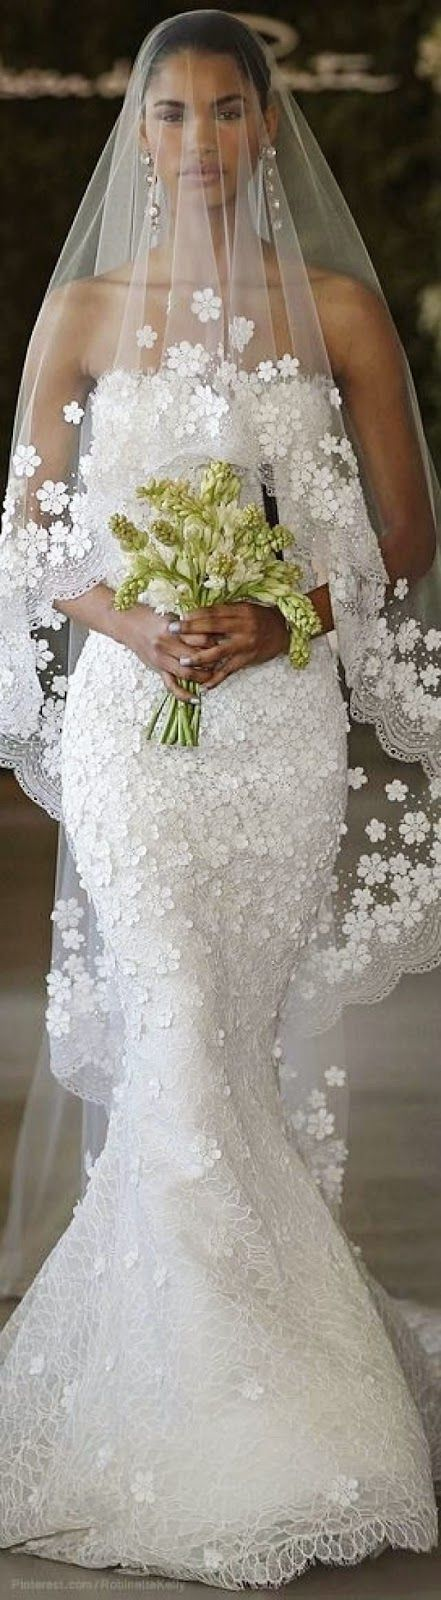 The 233 best Bridal Veils & Headpieces images on Pinterest   Bridal ...